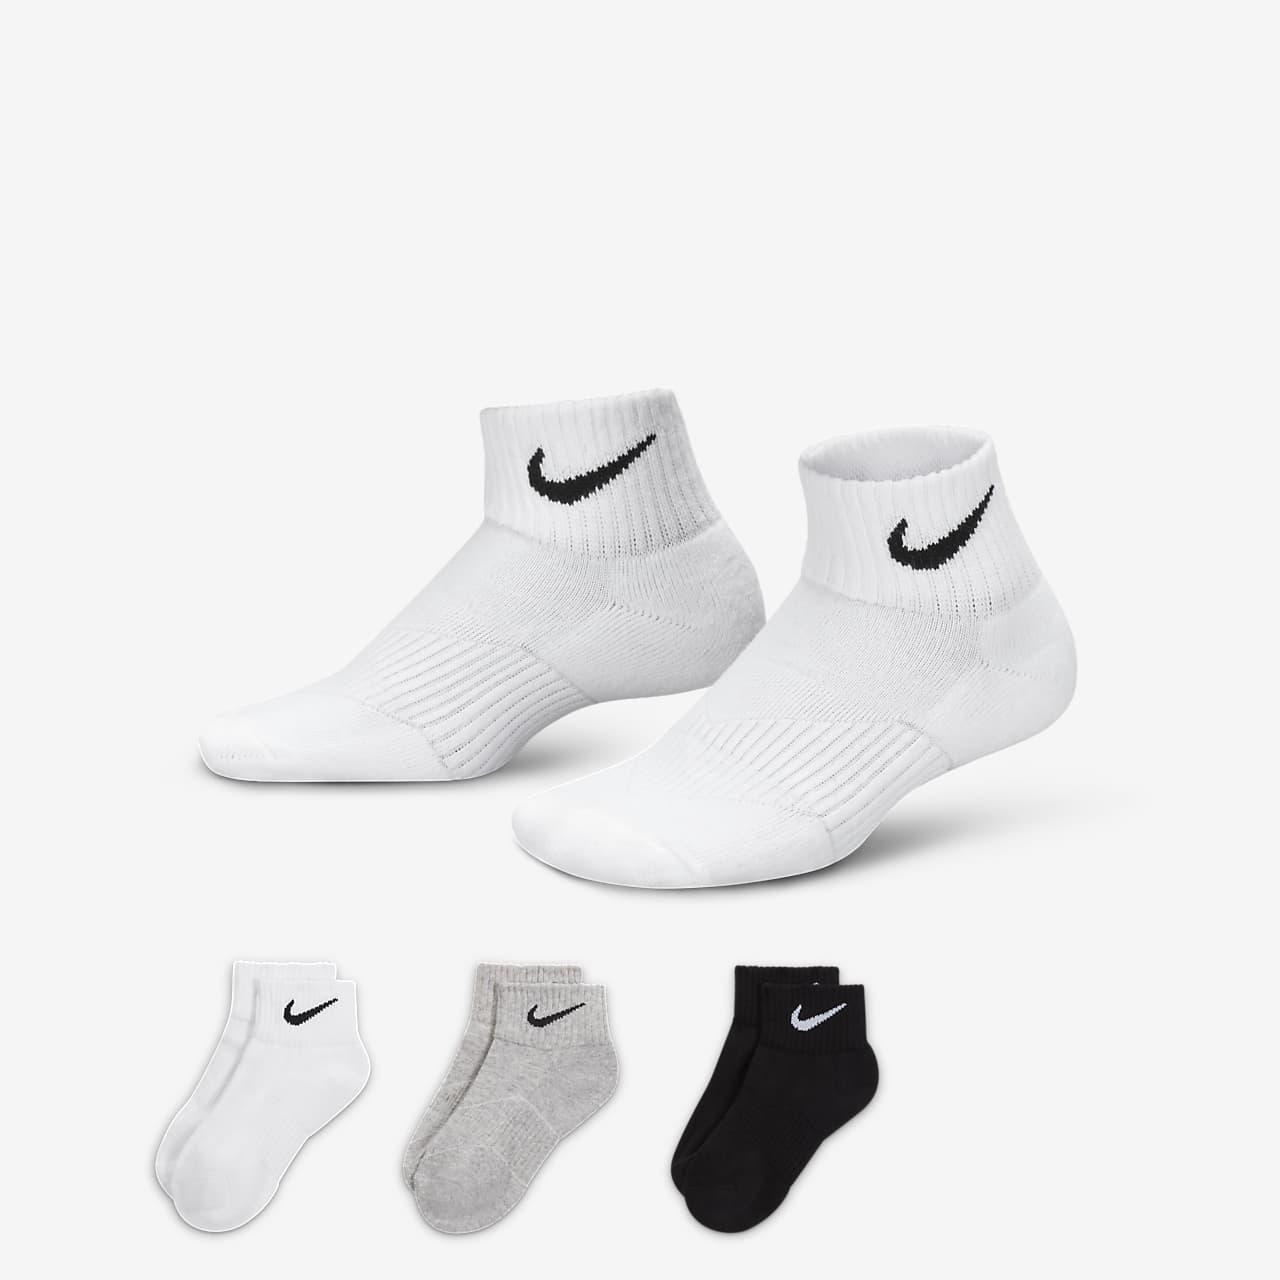 Skarpety dla dużych dzieci Nike Performance Cushion Quarter (3 pary)